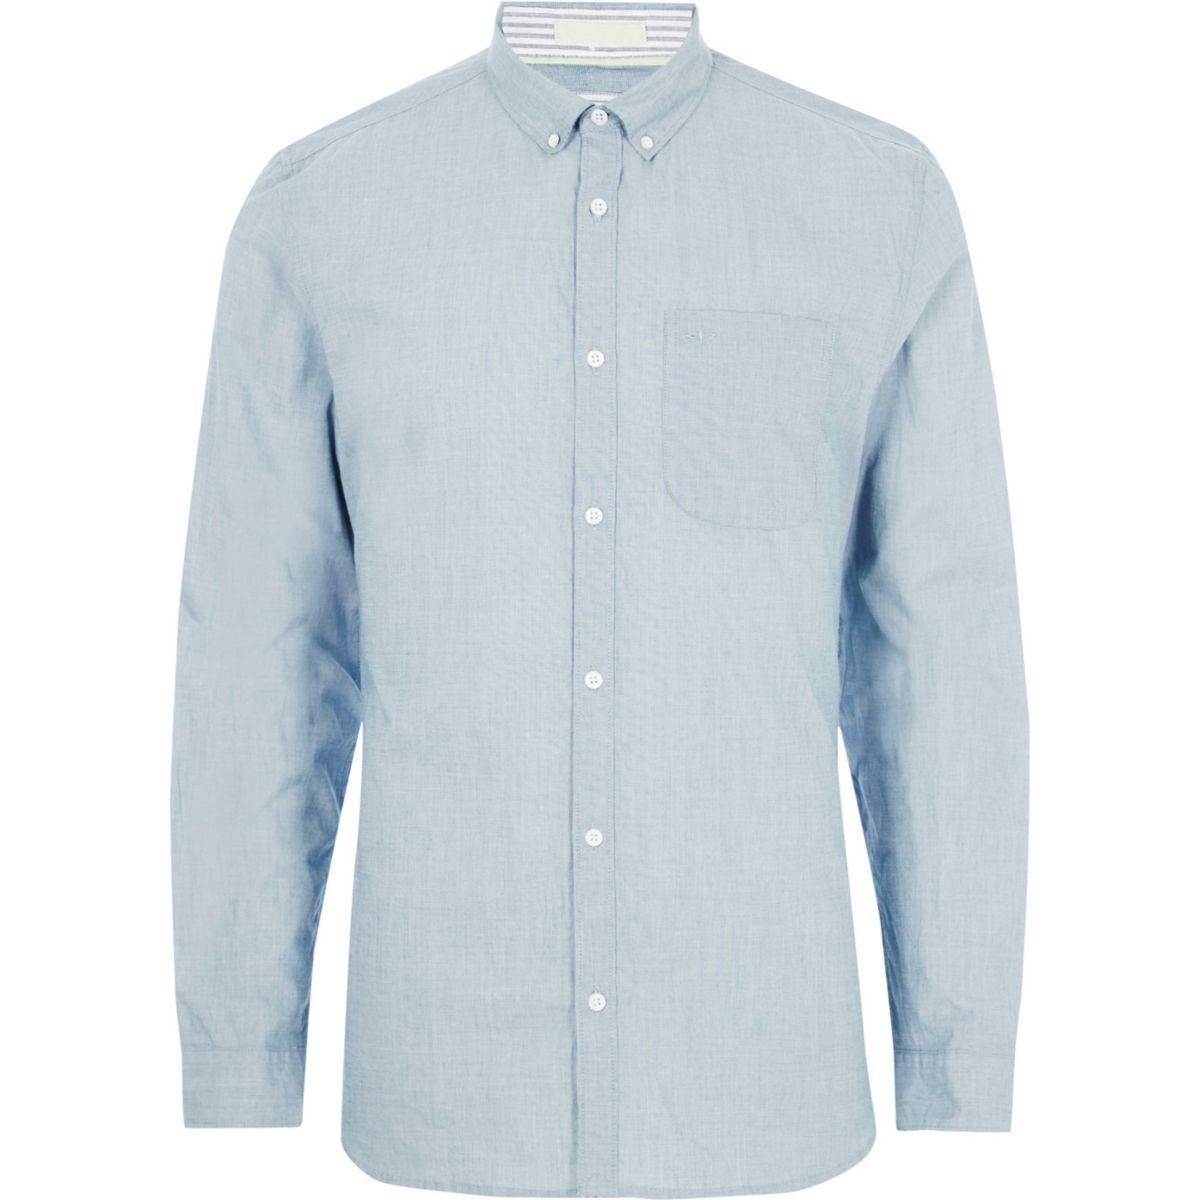 Light blue slim fit long sleeve shirt for £10 free C&C @Riverisland